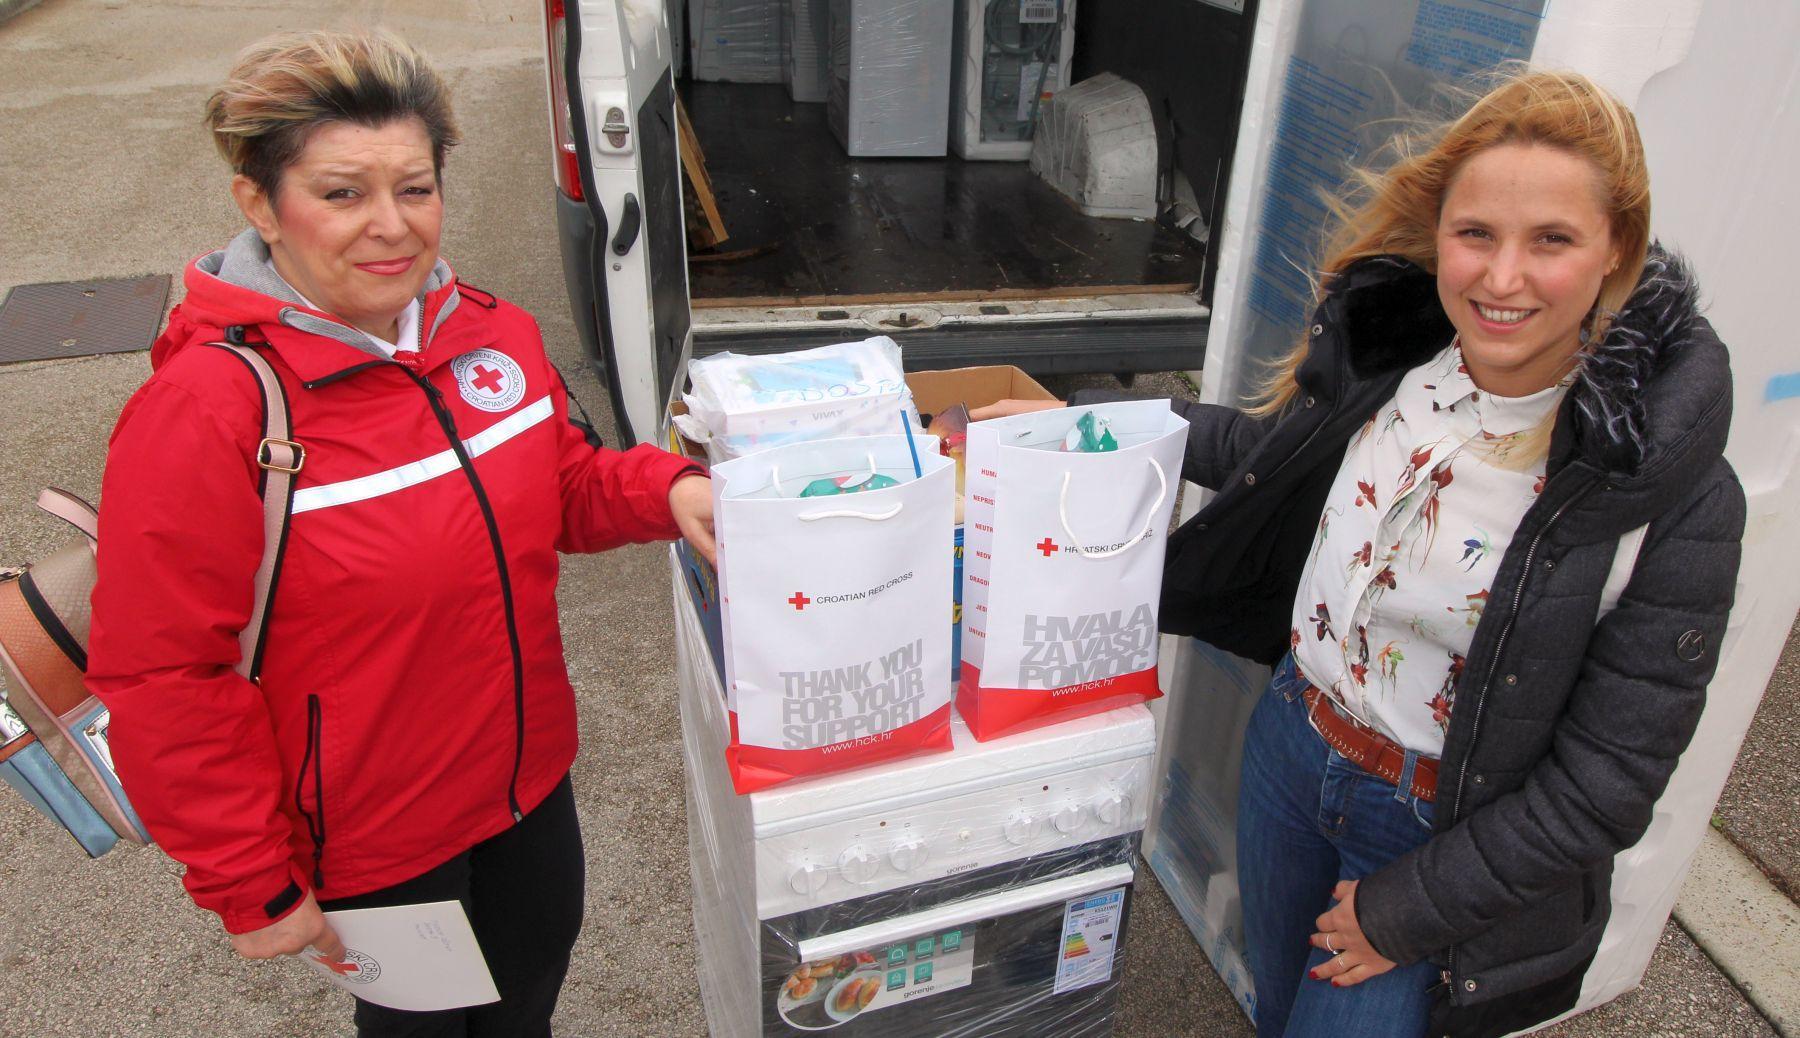 Crveni križ darivao potrebite